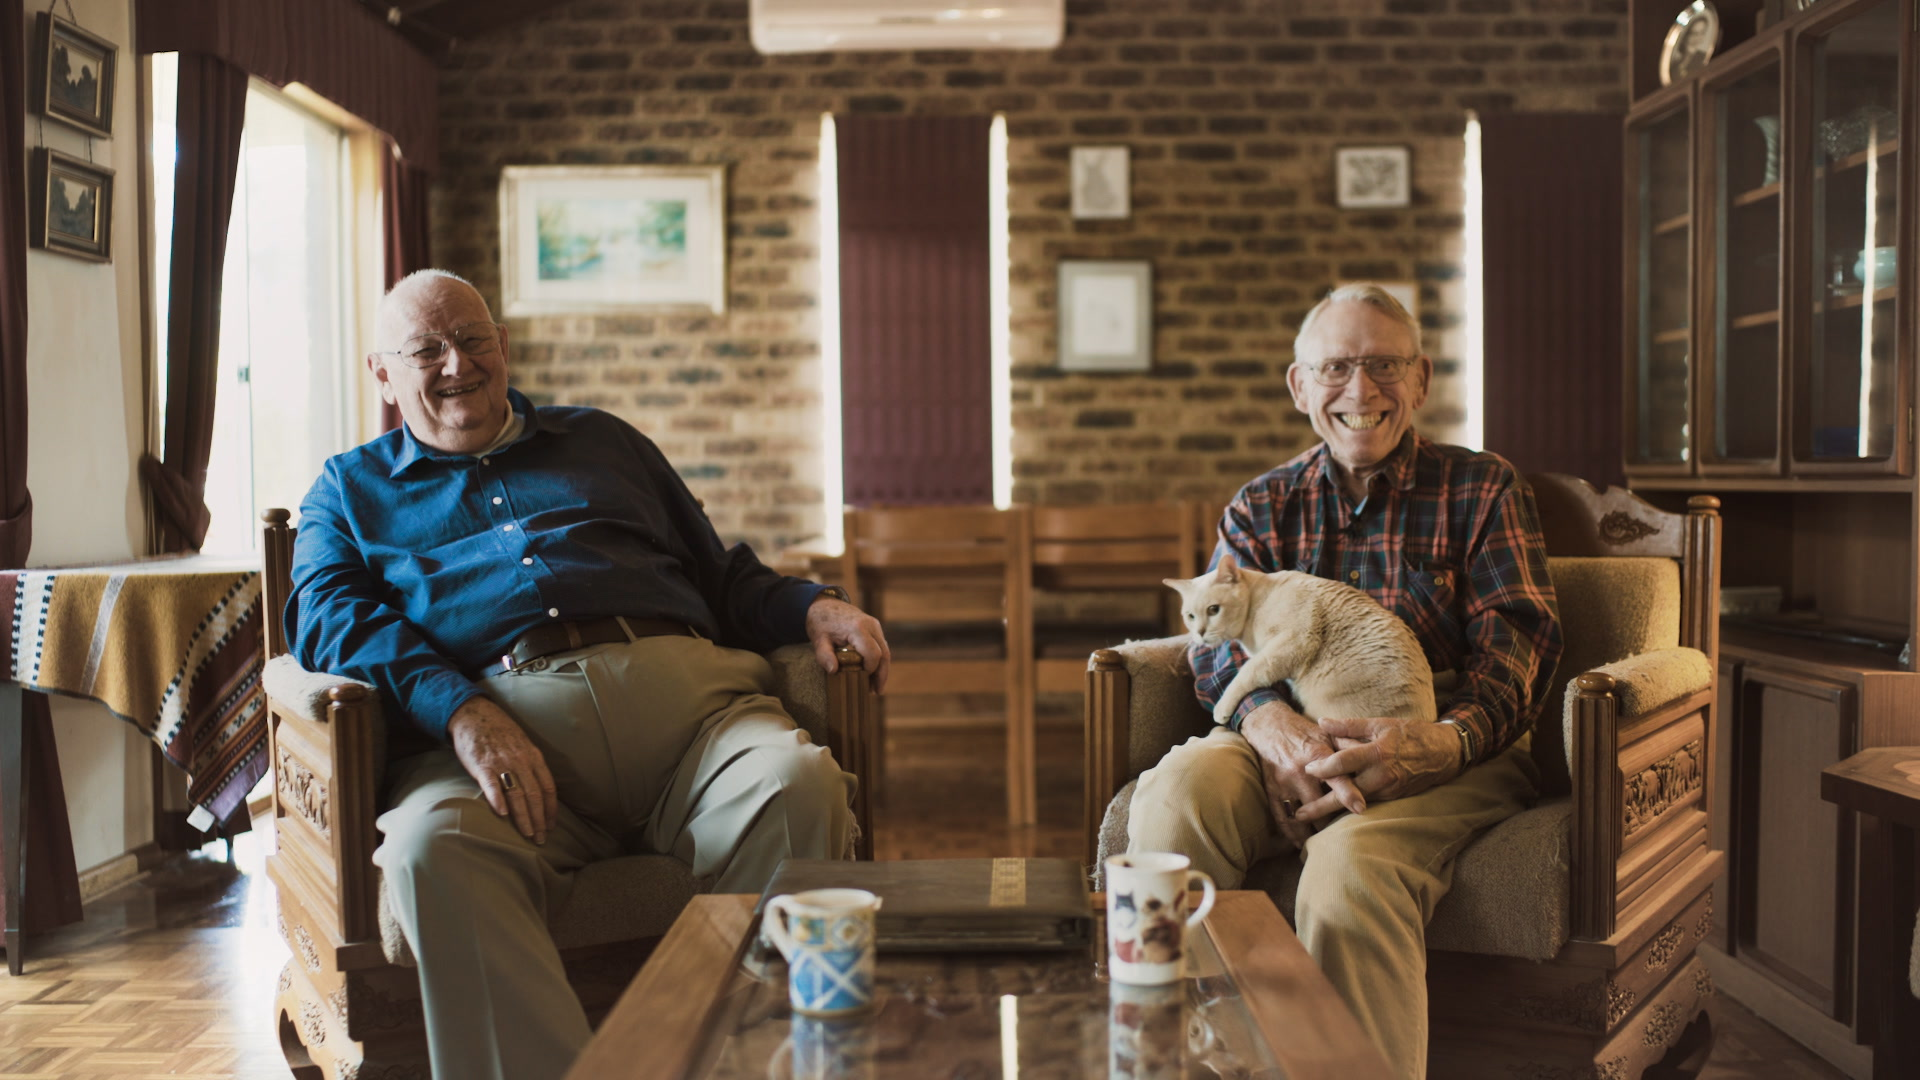 Terry + John | Wentworth Falls, Australia | Silvermere